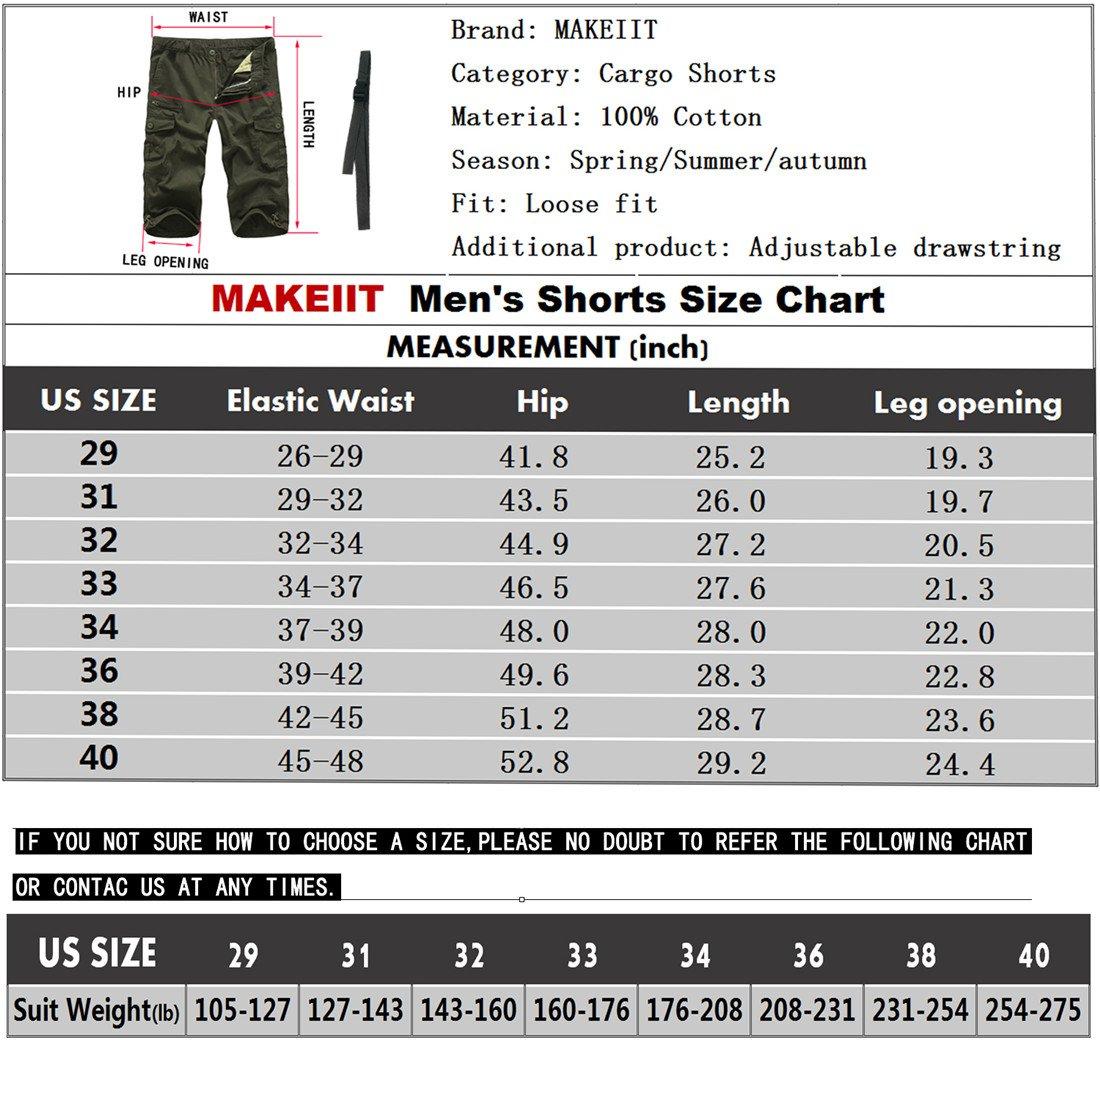 MAKEIIT Men's Juniors Cargo Shorts XXXL Cargo Shorts Dri Fit Cargo Shorts with Multi-Pocket by MAKEIIT (Image #5)